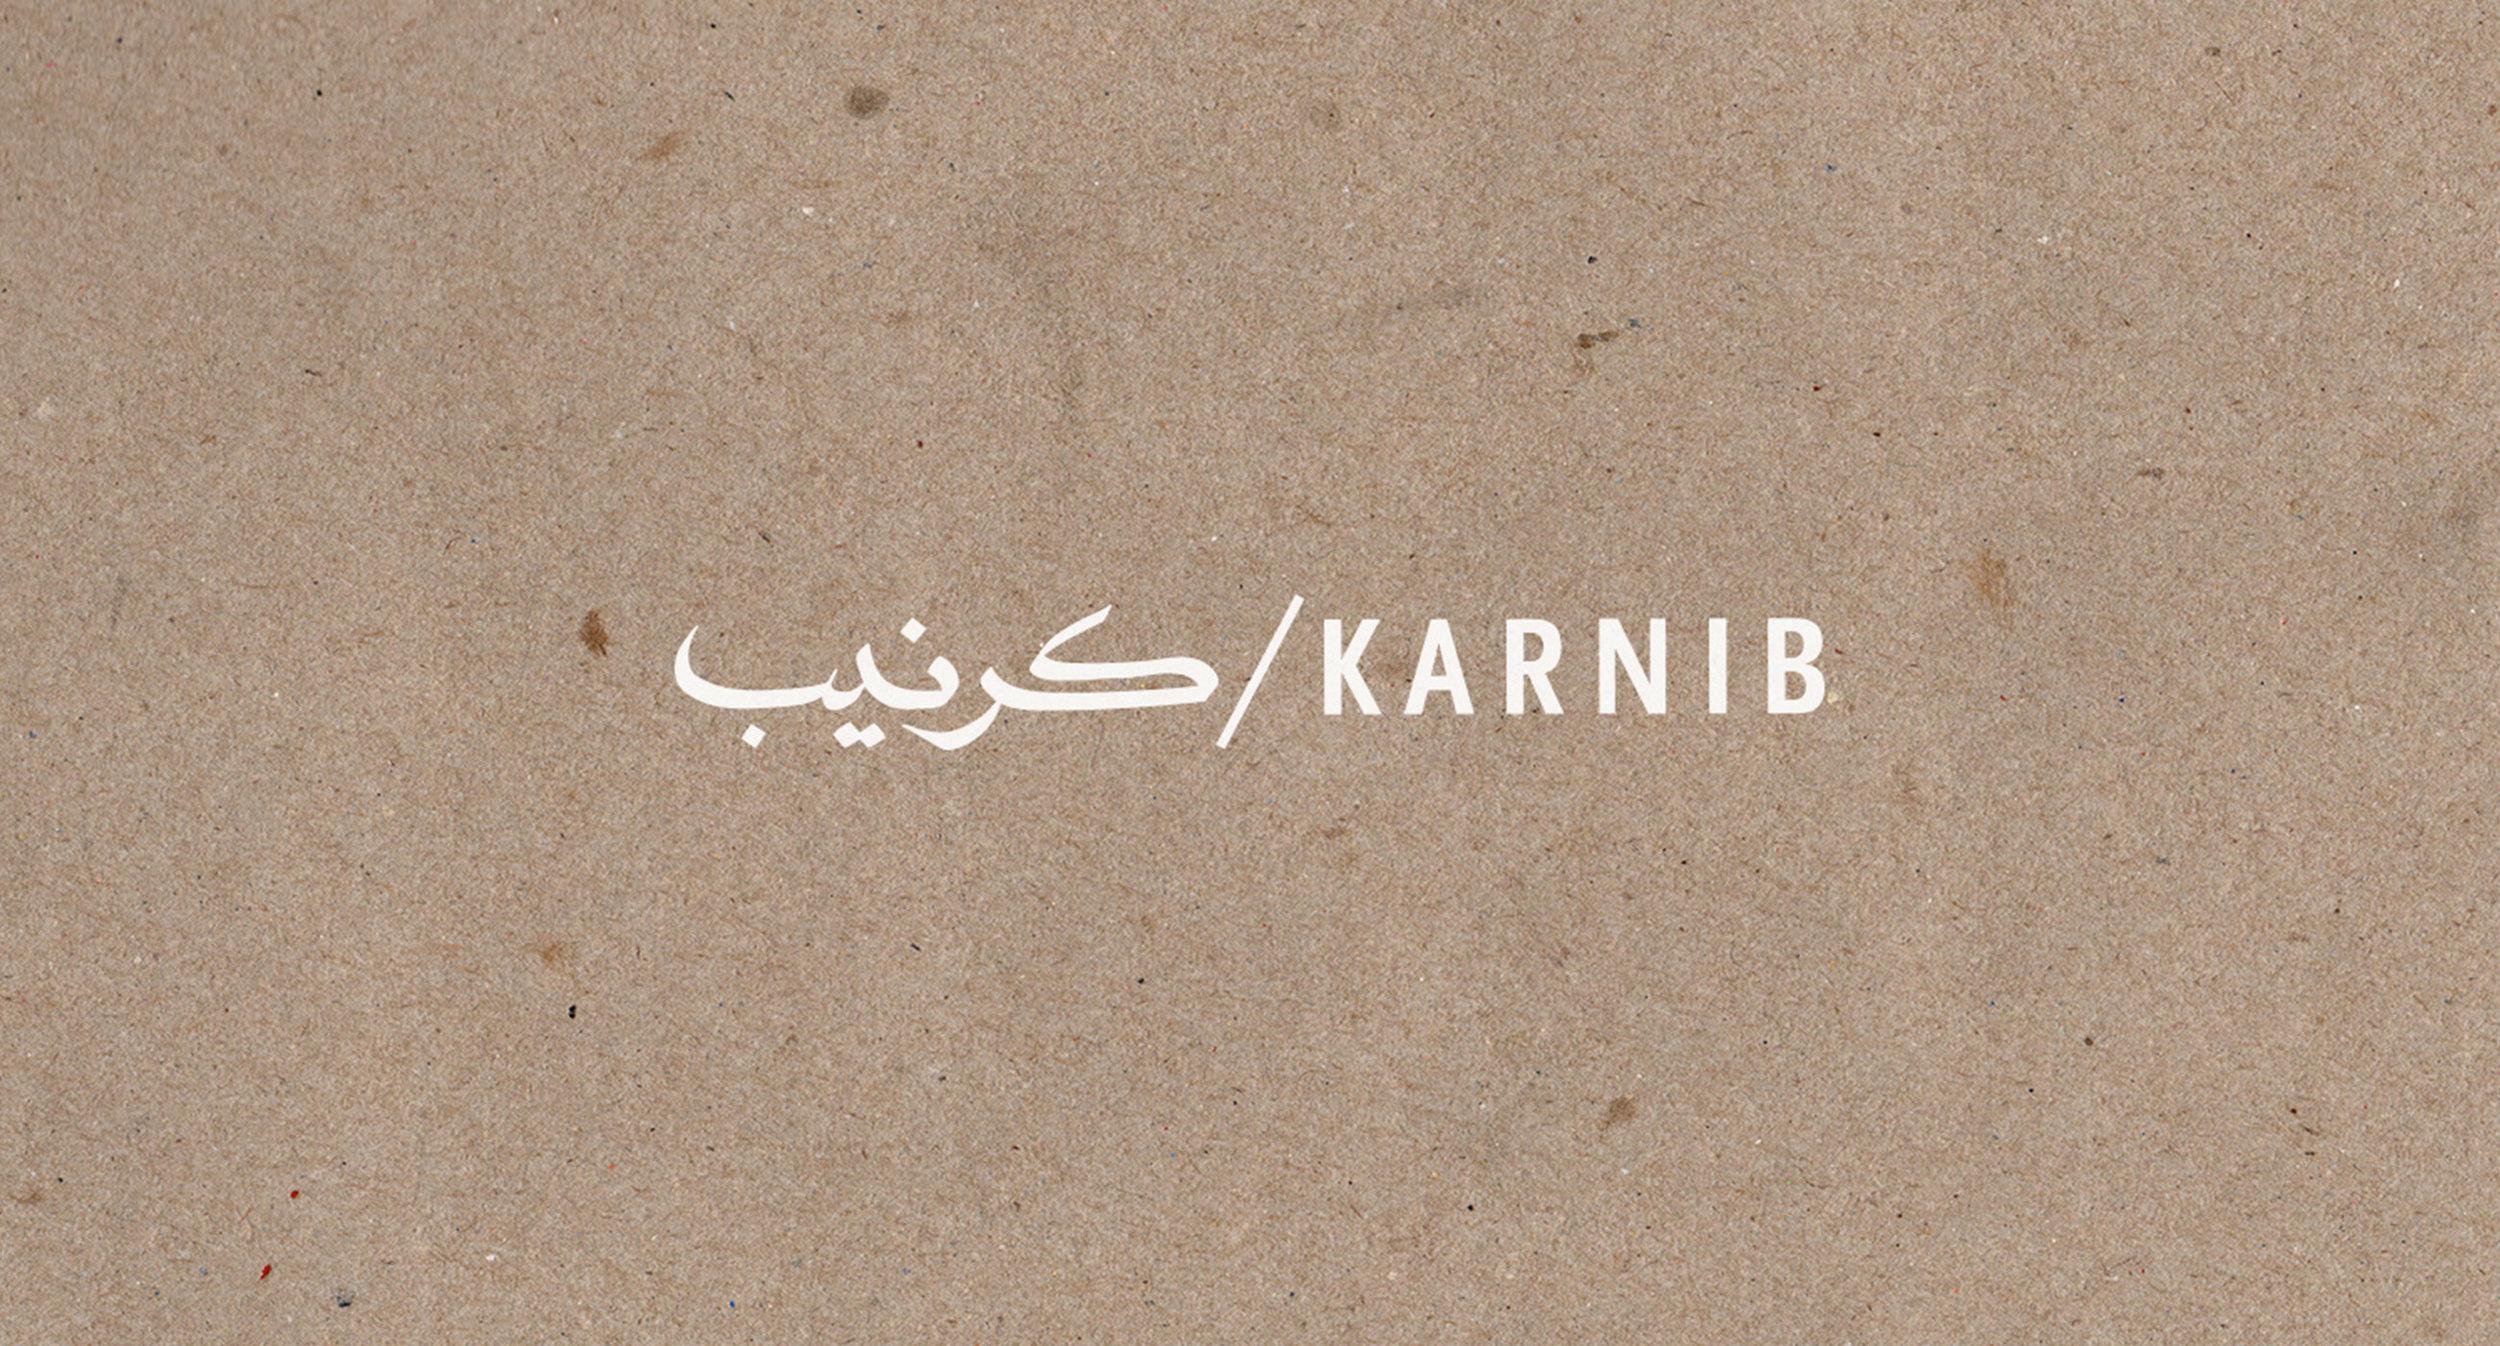 Logos-Karnib.jpg